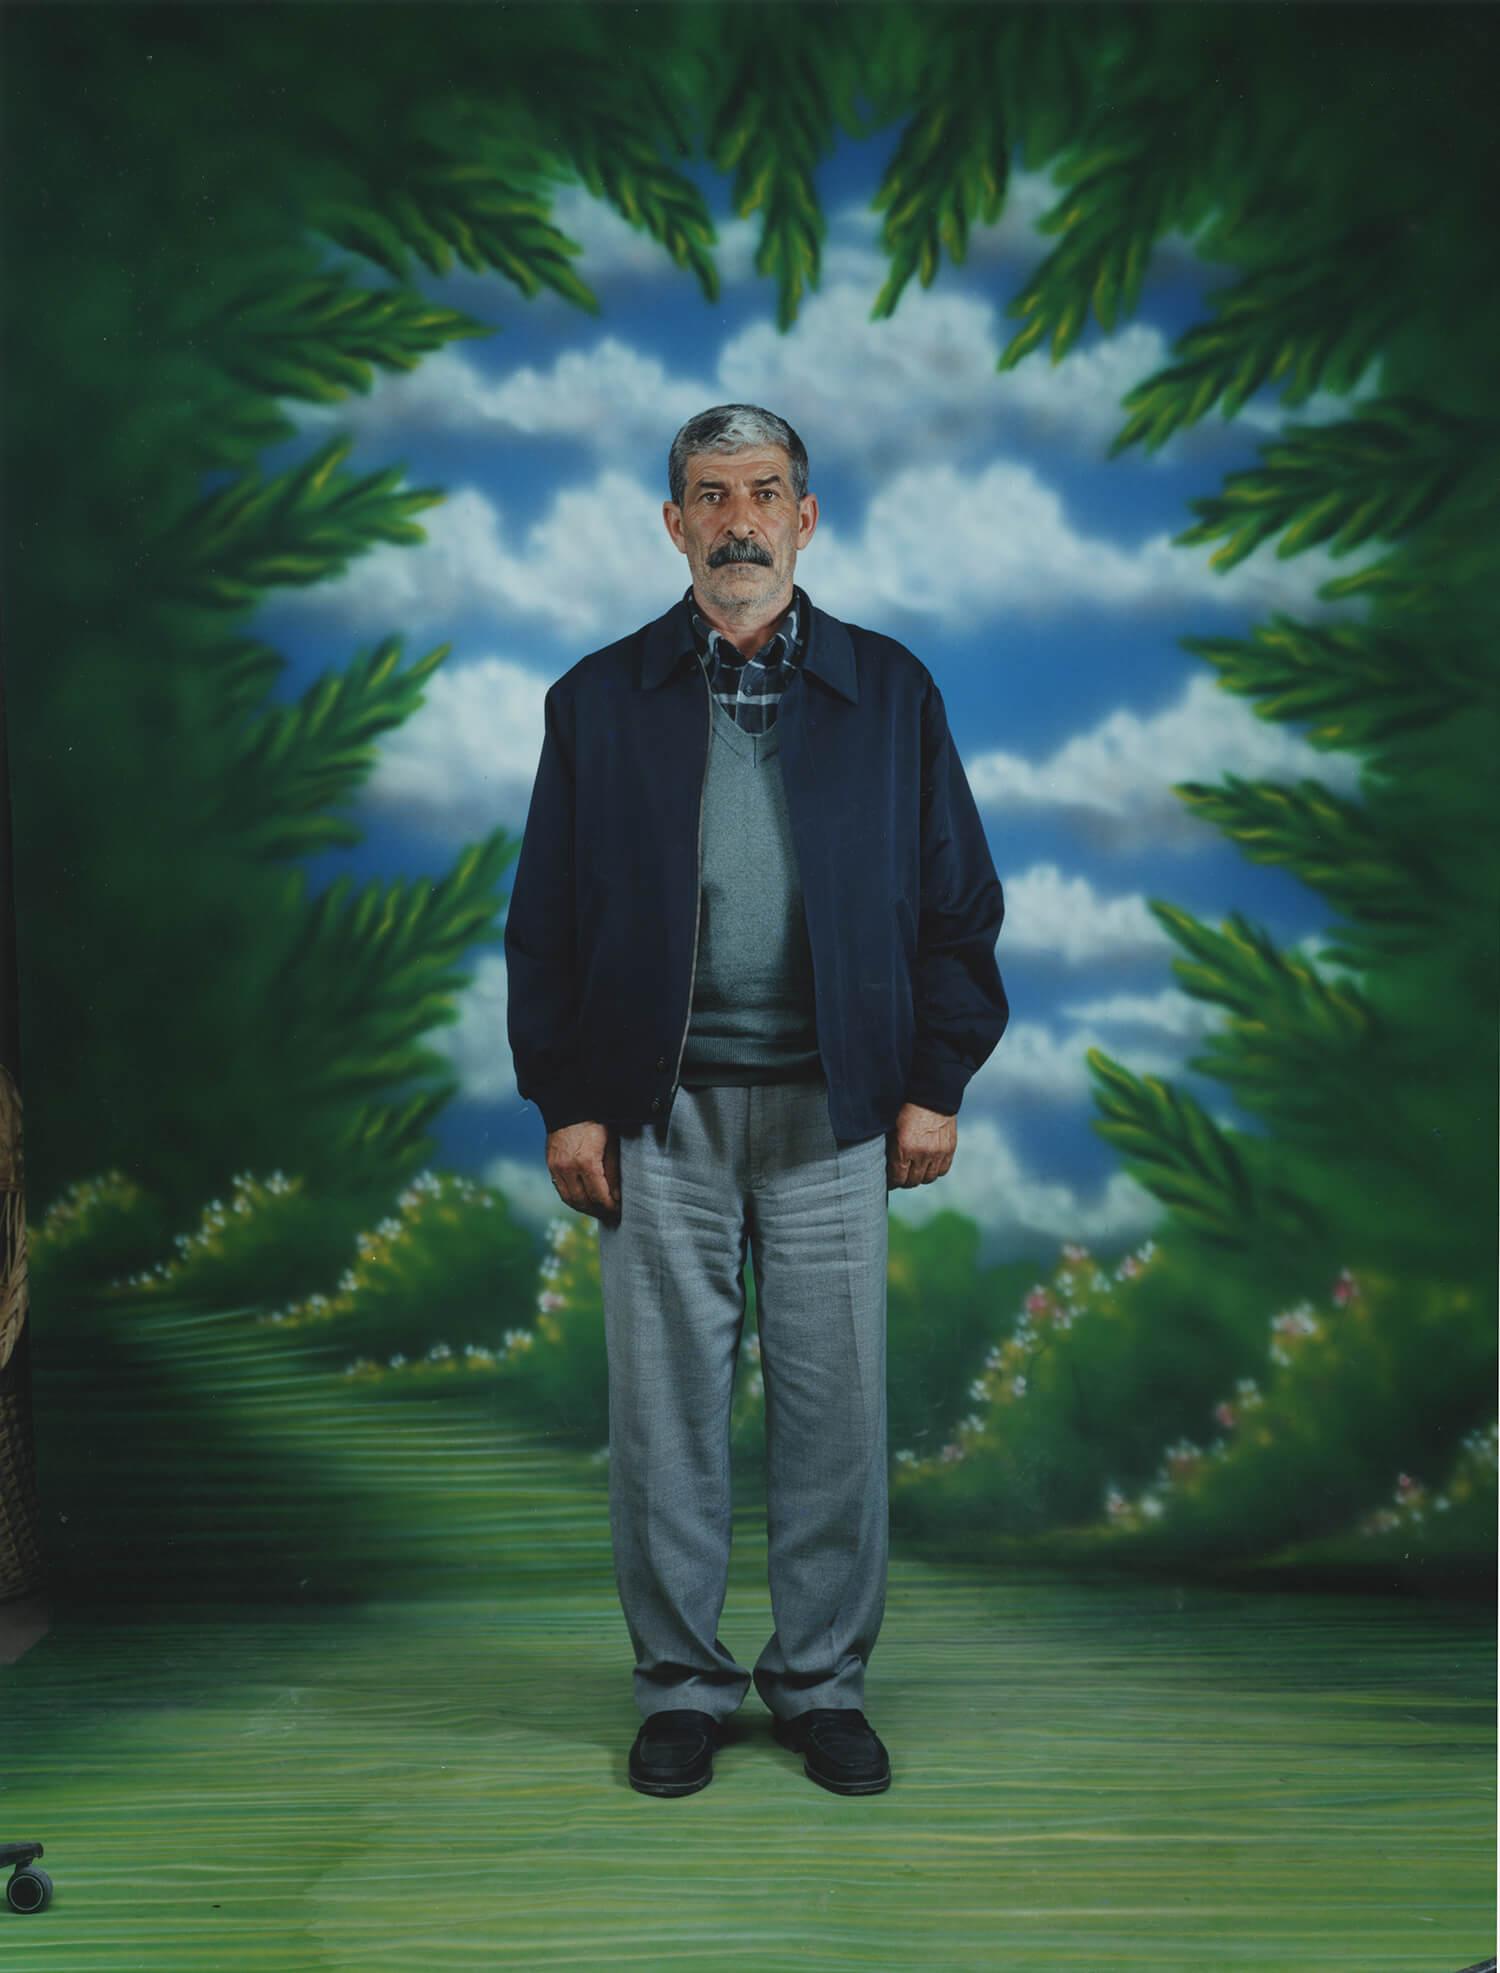 Cizre, Kurdistan, C-type print, 16 x 20 inches, 2003